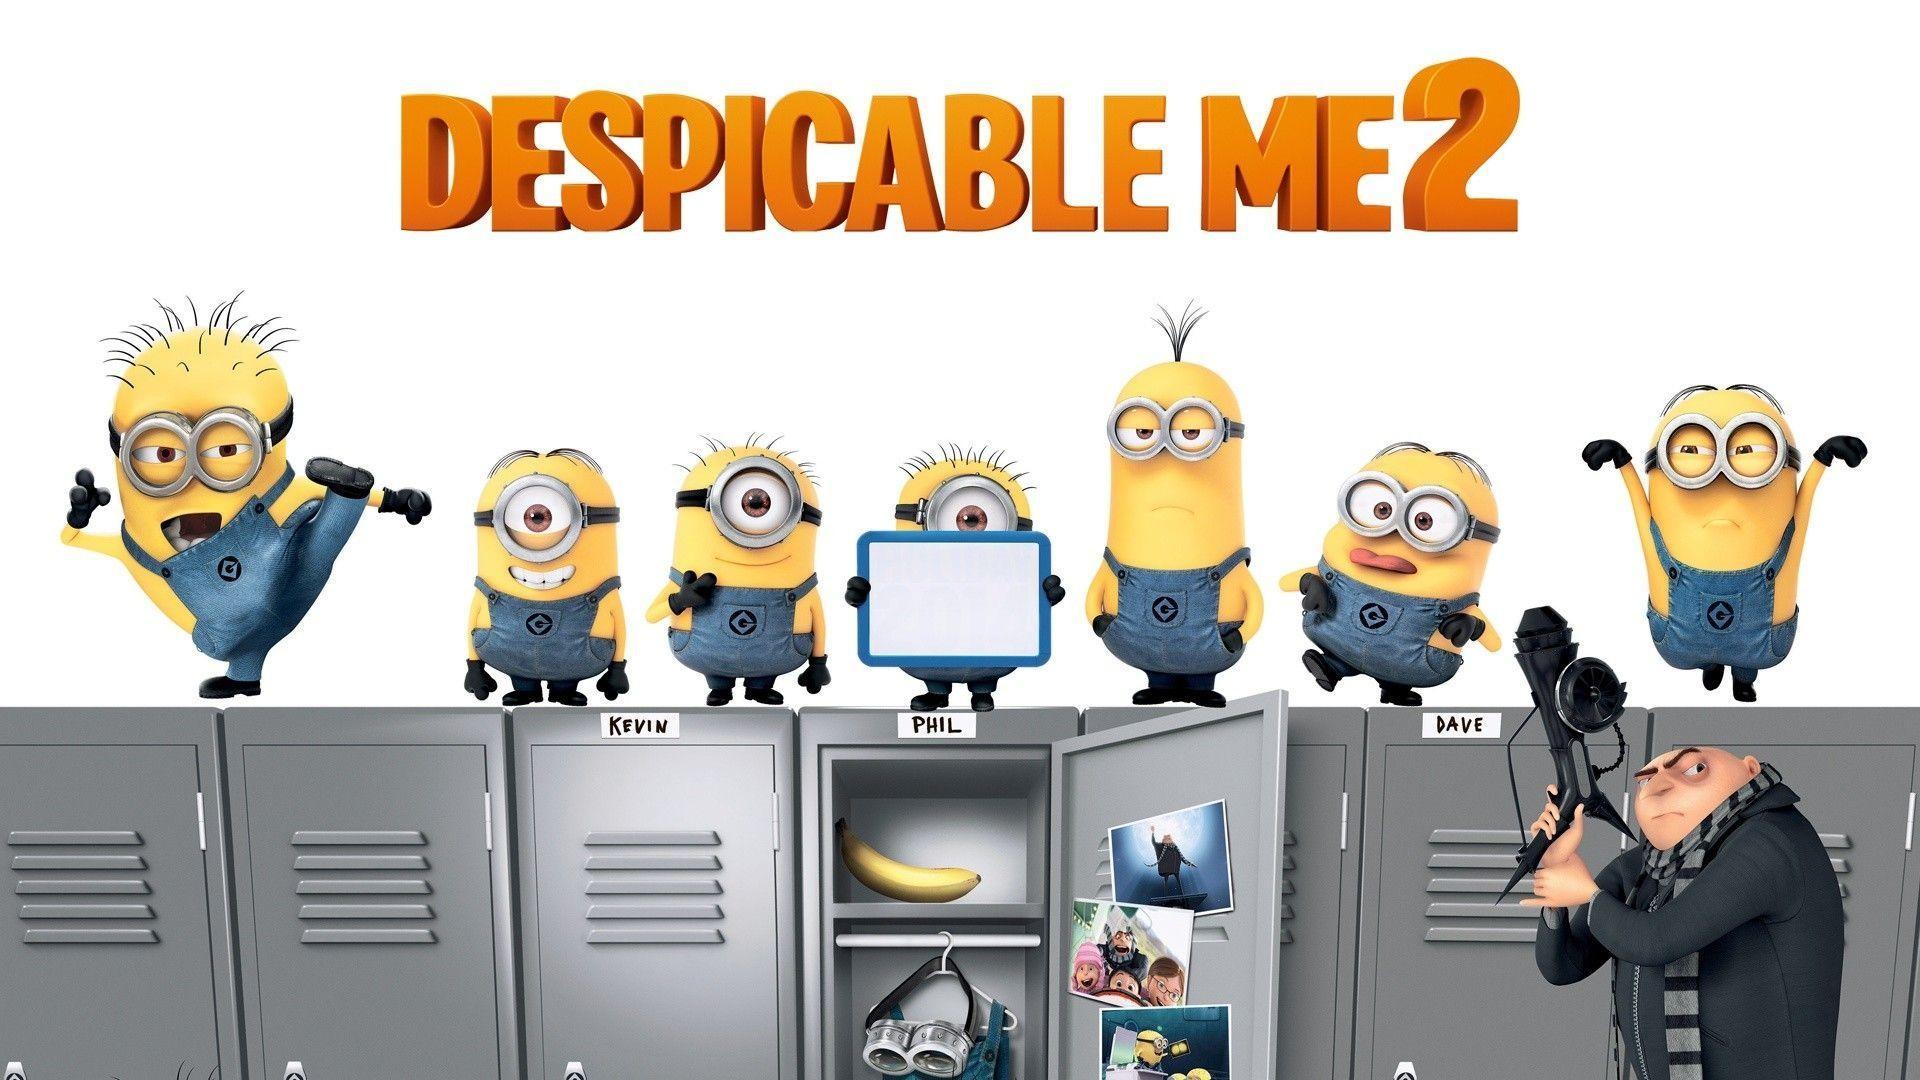 Funny : Despicable Me Cool Minion Wallpaper Foolhardi 1080x1920px .